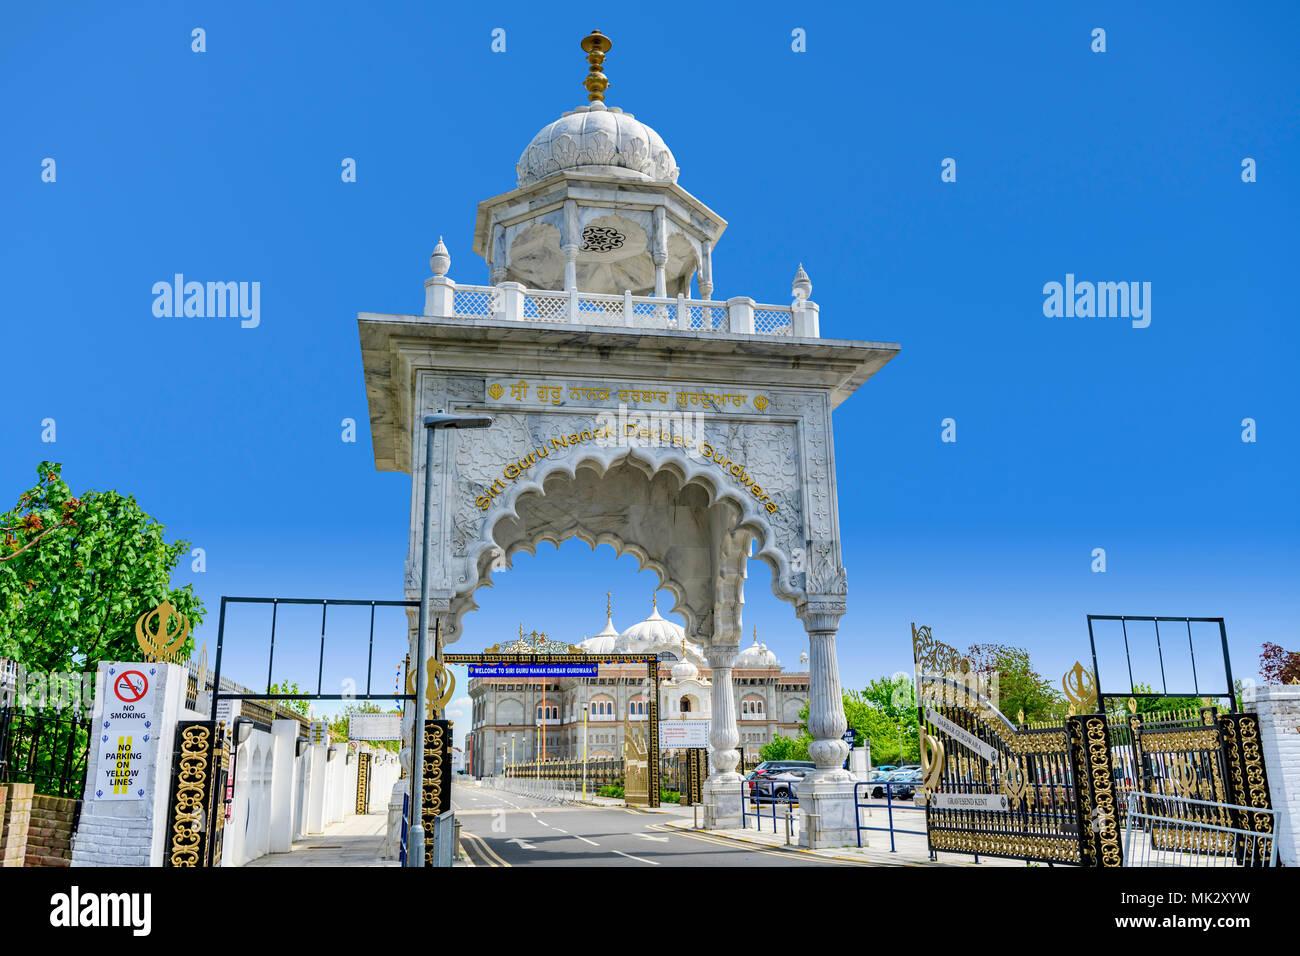 Entrance arch to Guru Nanak Darbar Gurdwara, the magnificent sikh temple ( Gurdwara )  in Gravesend Kent - Stock Image